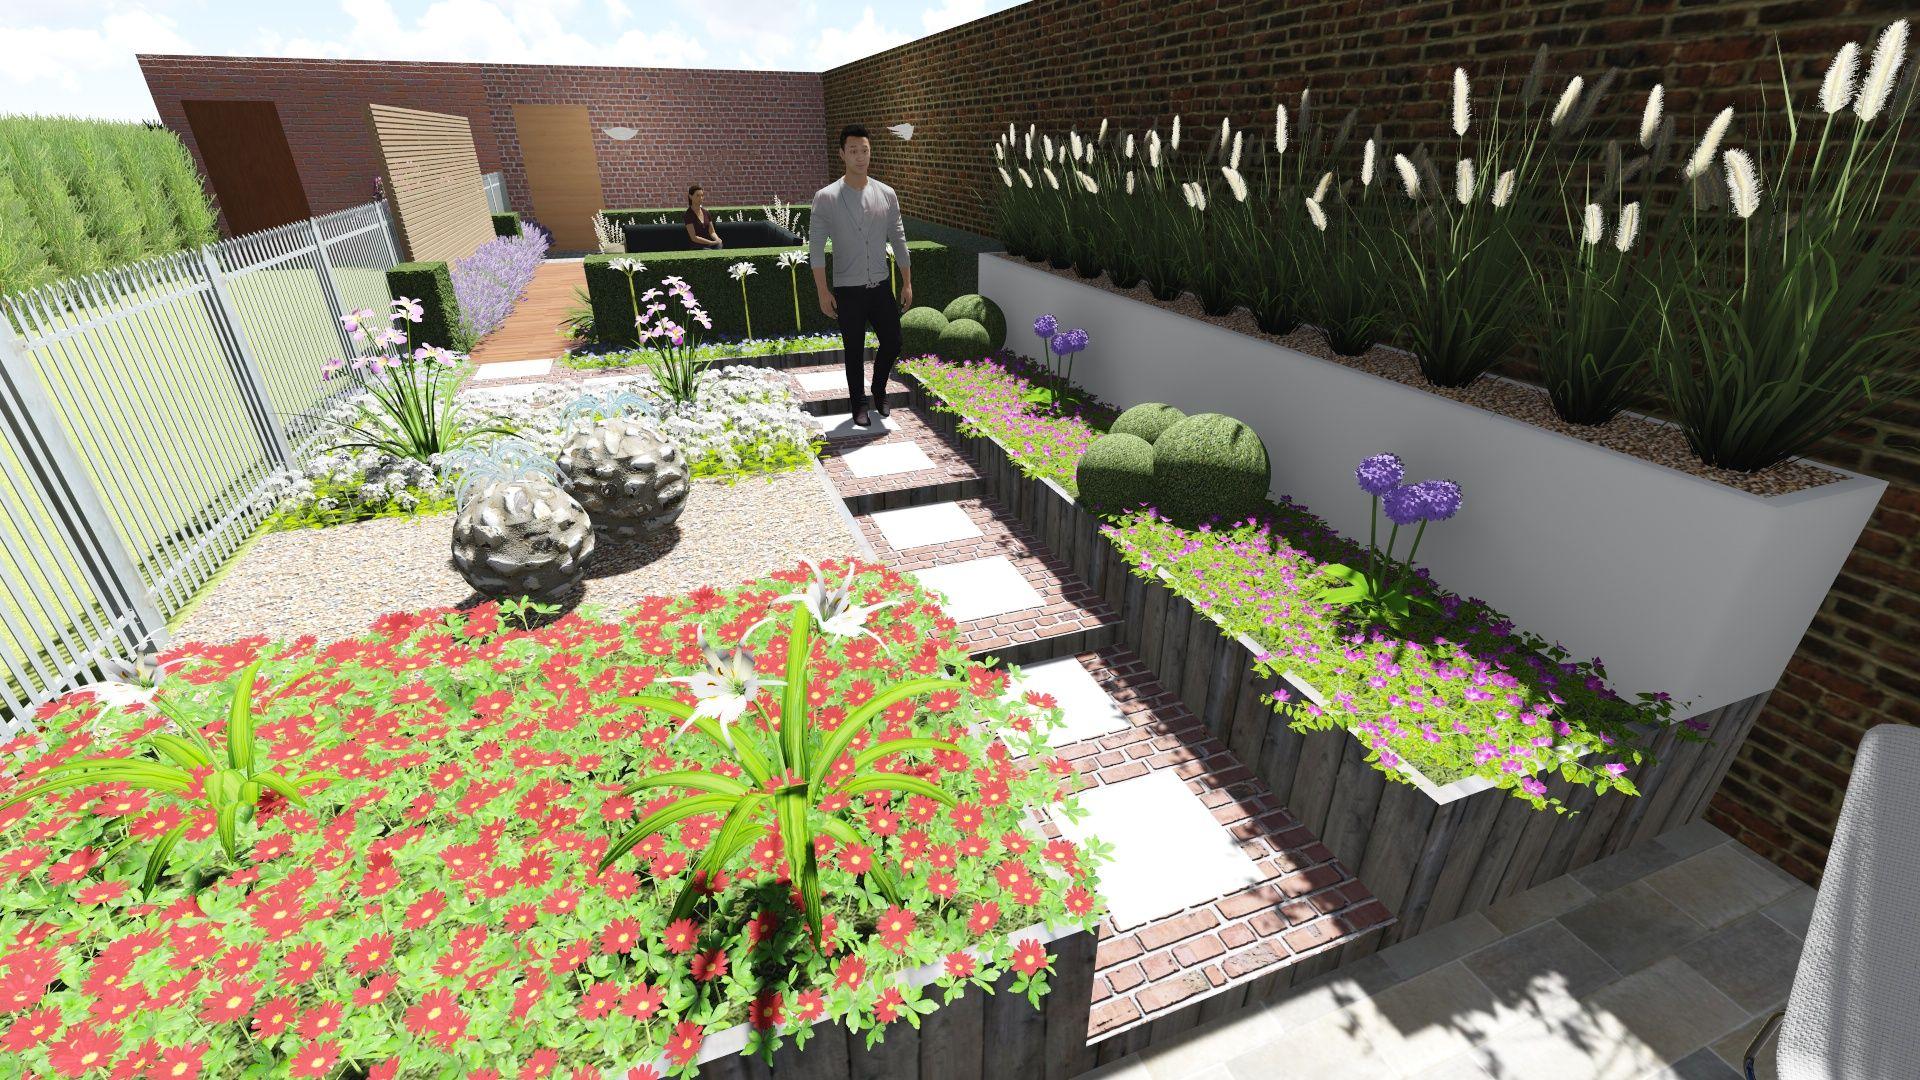 3d ontwerp stadstuin met hoogteverschil tuinarchitectuur for 3d tuinarchitect